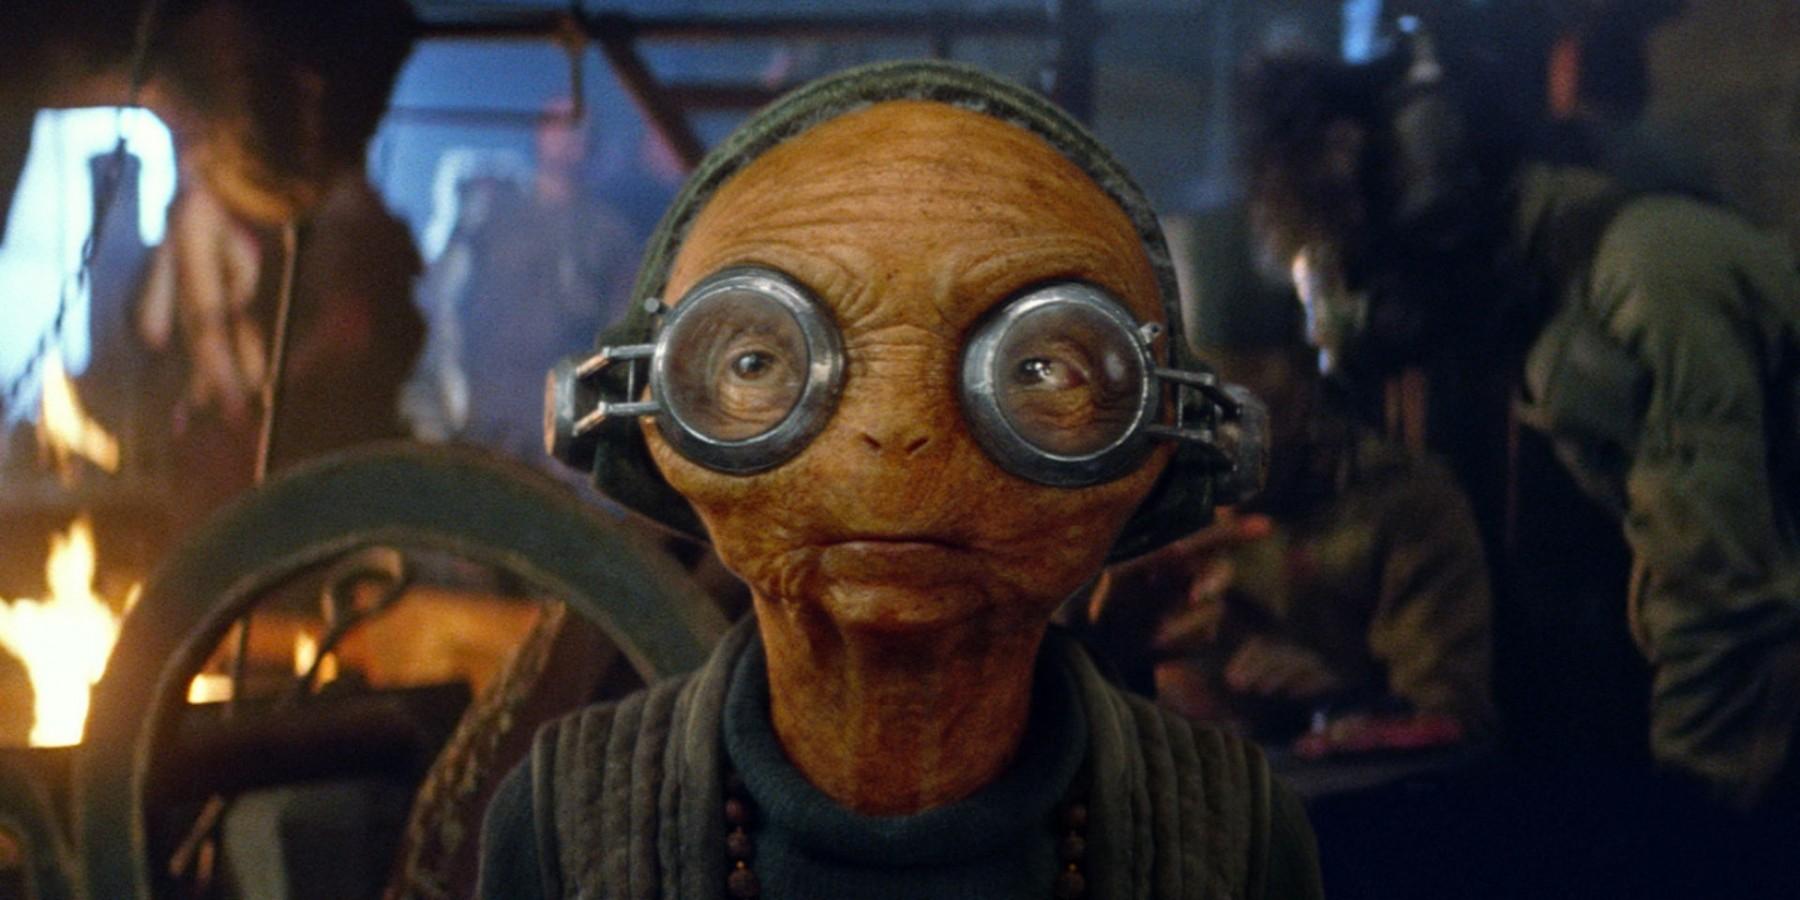 Maz Kanata Star Wars Episode 7 The Force Awakens